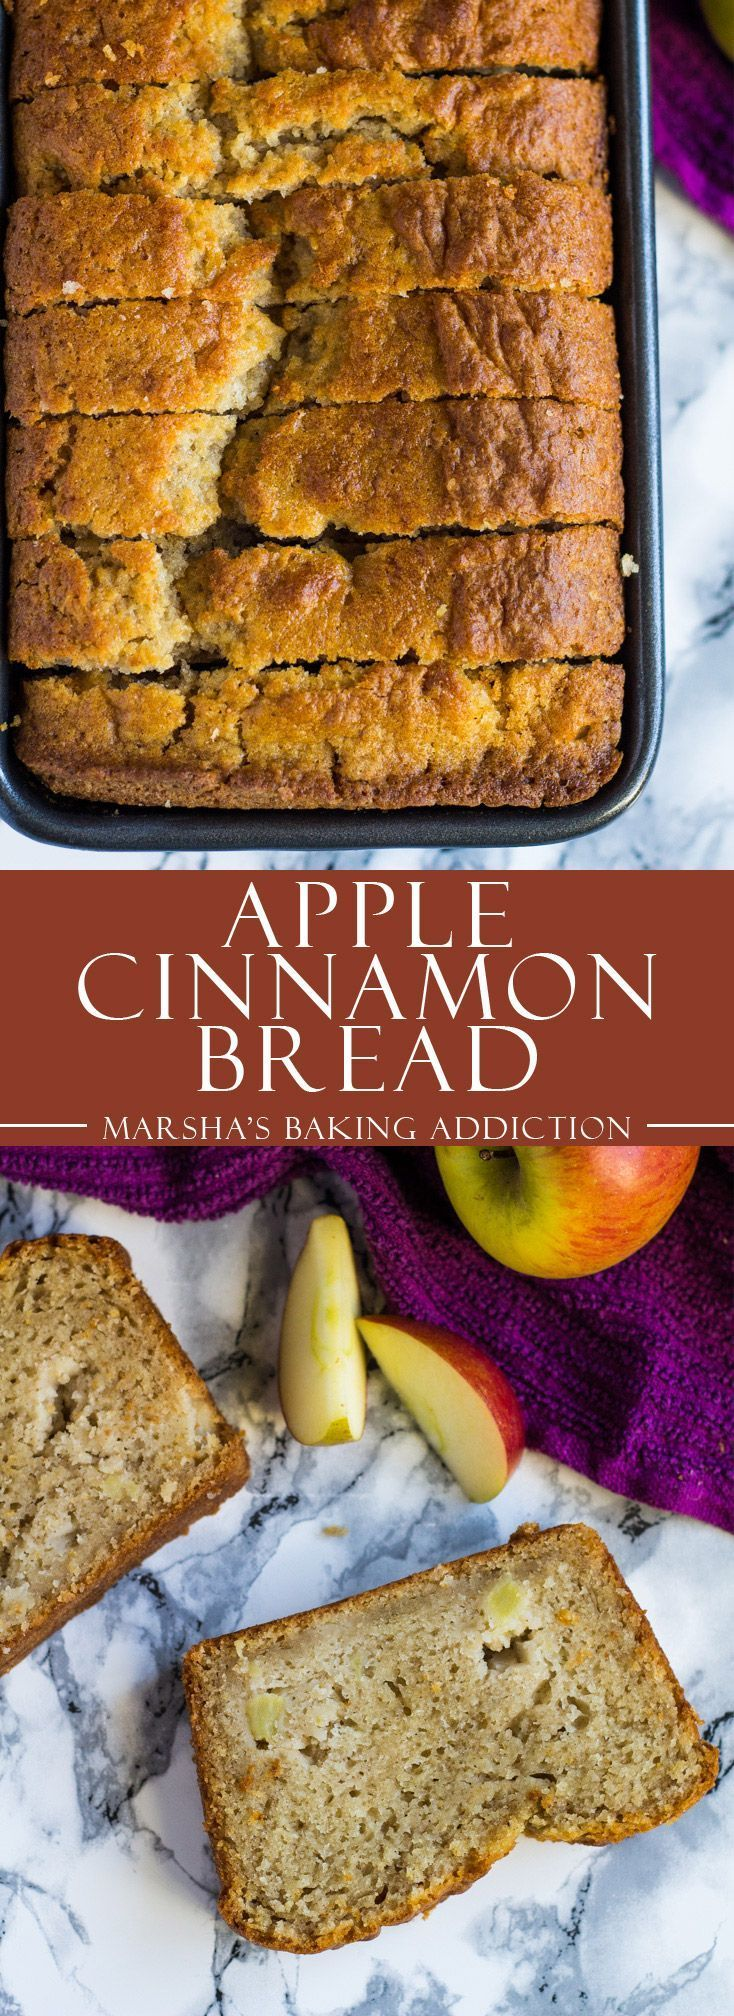 Apple Cinnamon Bread | marshasbakingaddi... /marshasbakeblog/